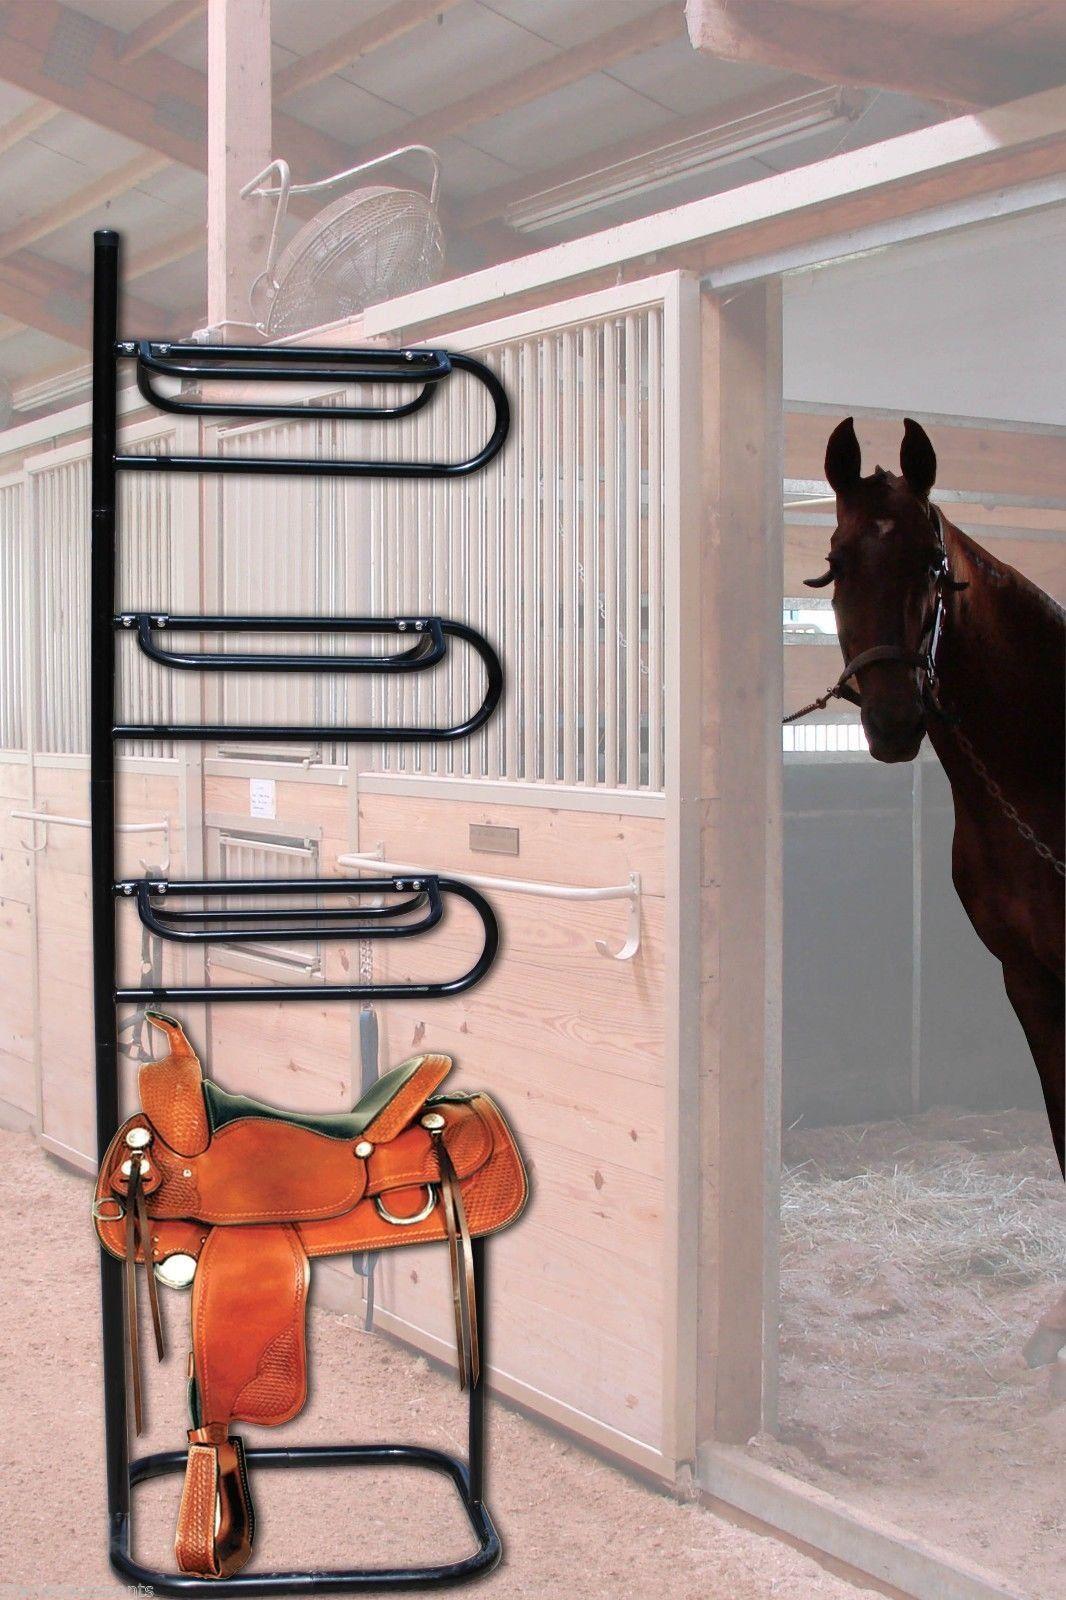 Titan 3 Tier Saddle Rack Display Holder Horse Equestrian Storage Heavy Duty Barn Ad Rack Ad Display Holder Barn Stables Saddle Rack Horse Equestrian